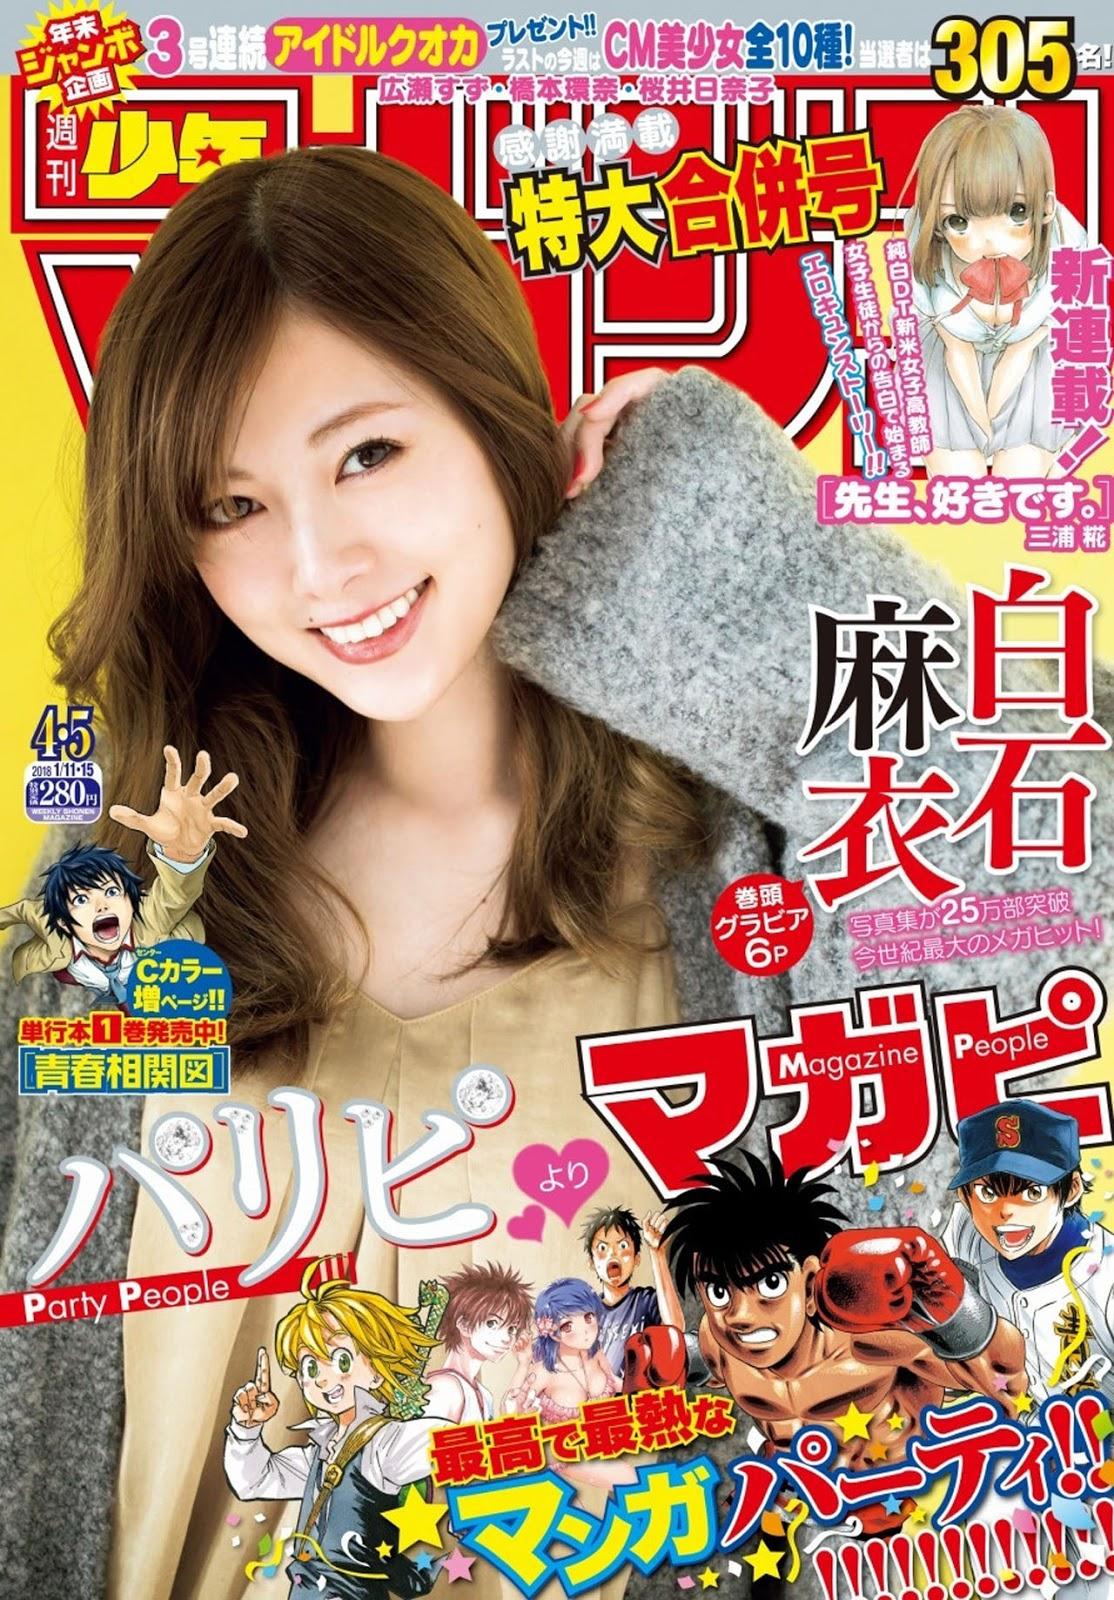 Shiraishi Mai 白石麻衣, Shonen Magazine 2018 No.04-05 (週刊少年マガジン 2018年04-05号)